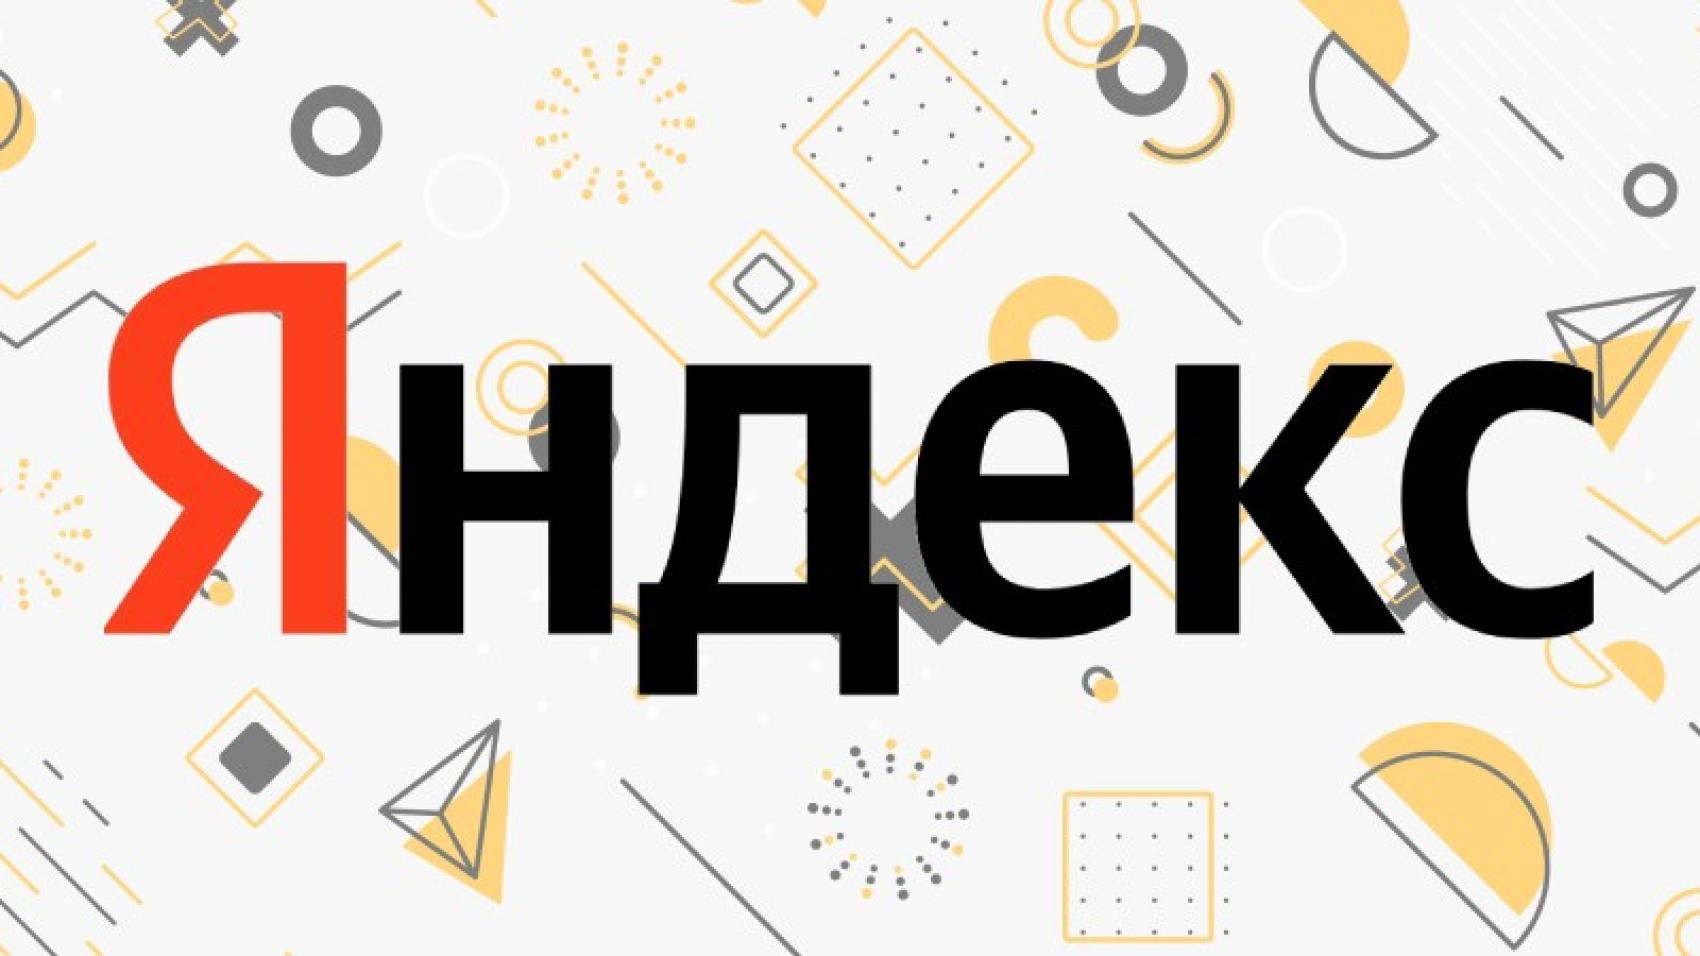 Яндекс представил Smart Design – новую технологию для объявлений в РСЯ